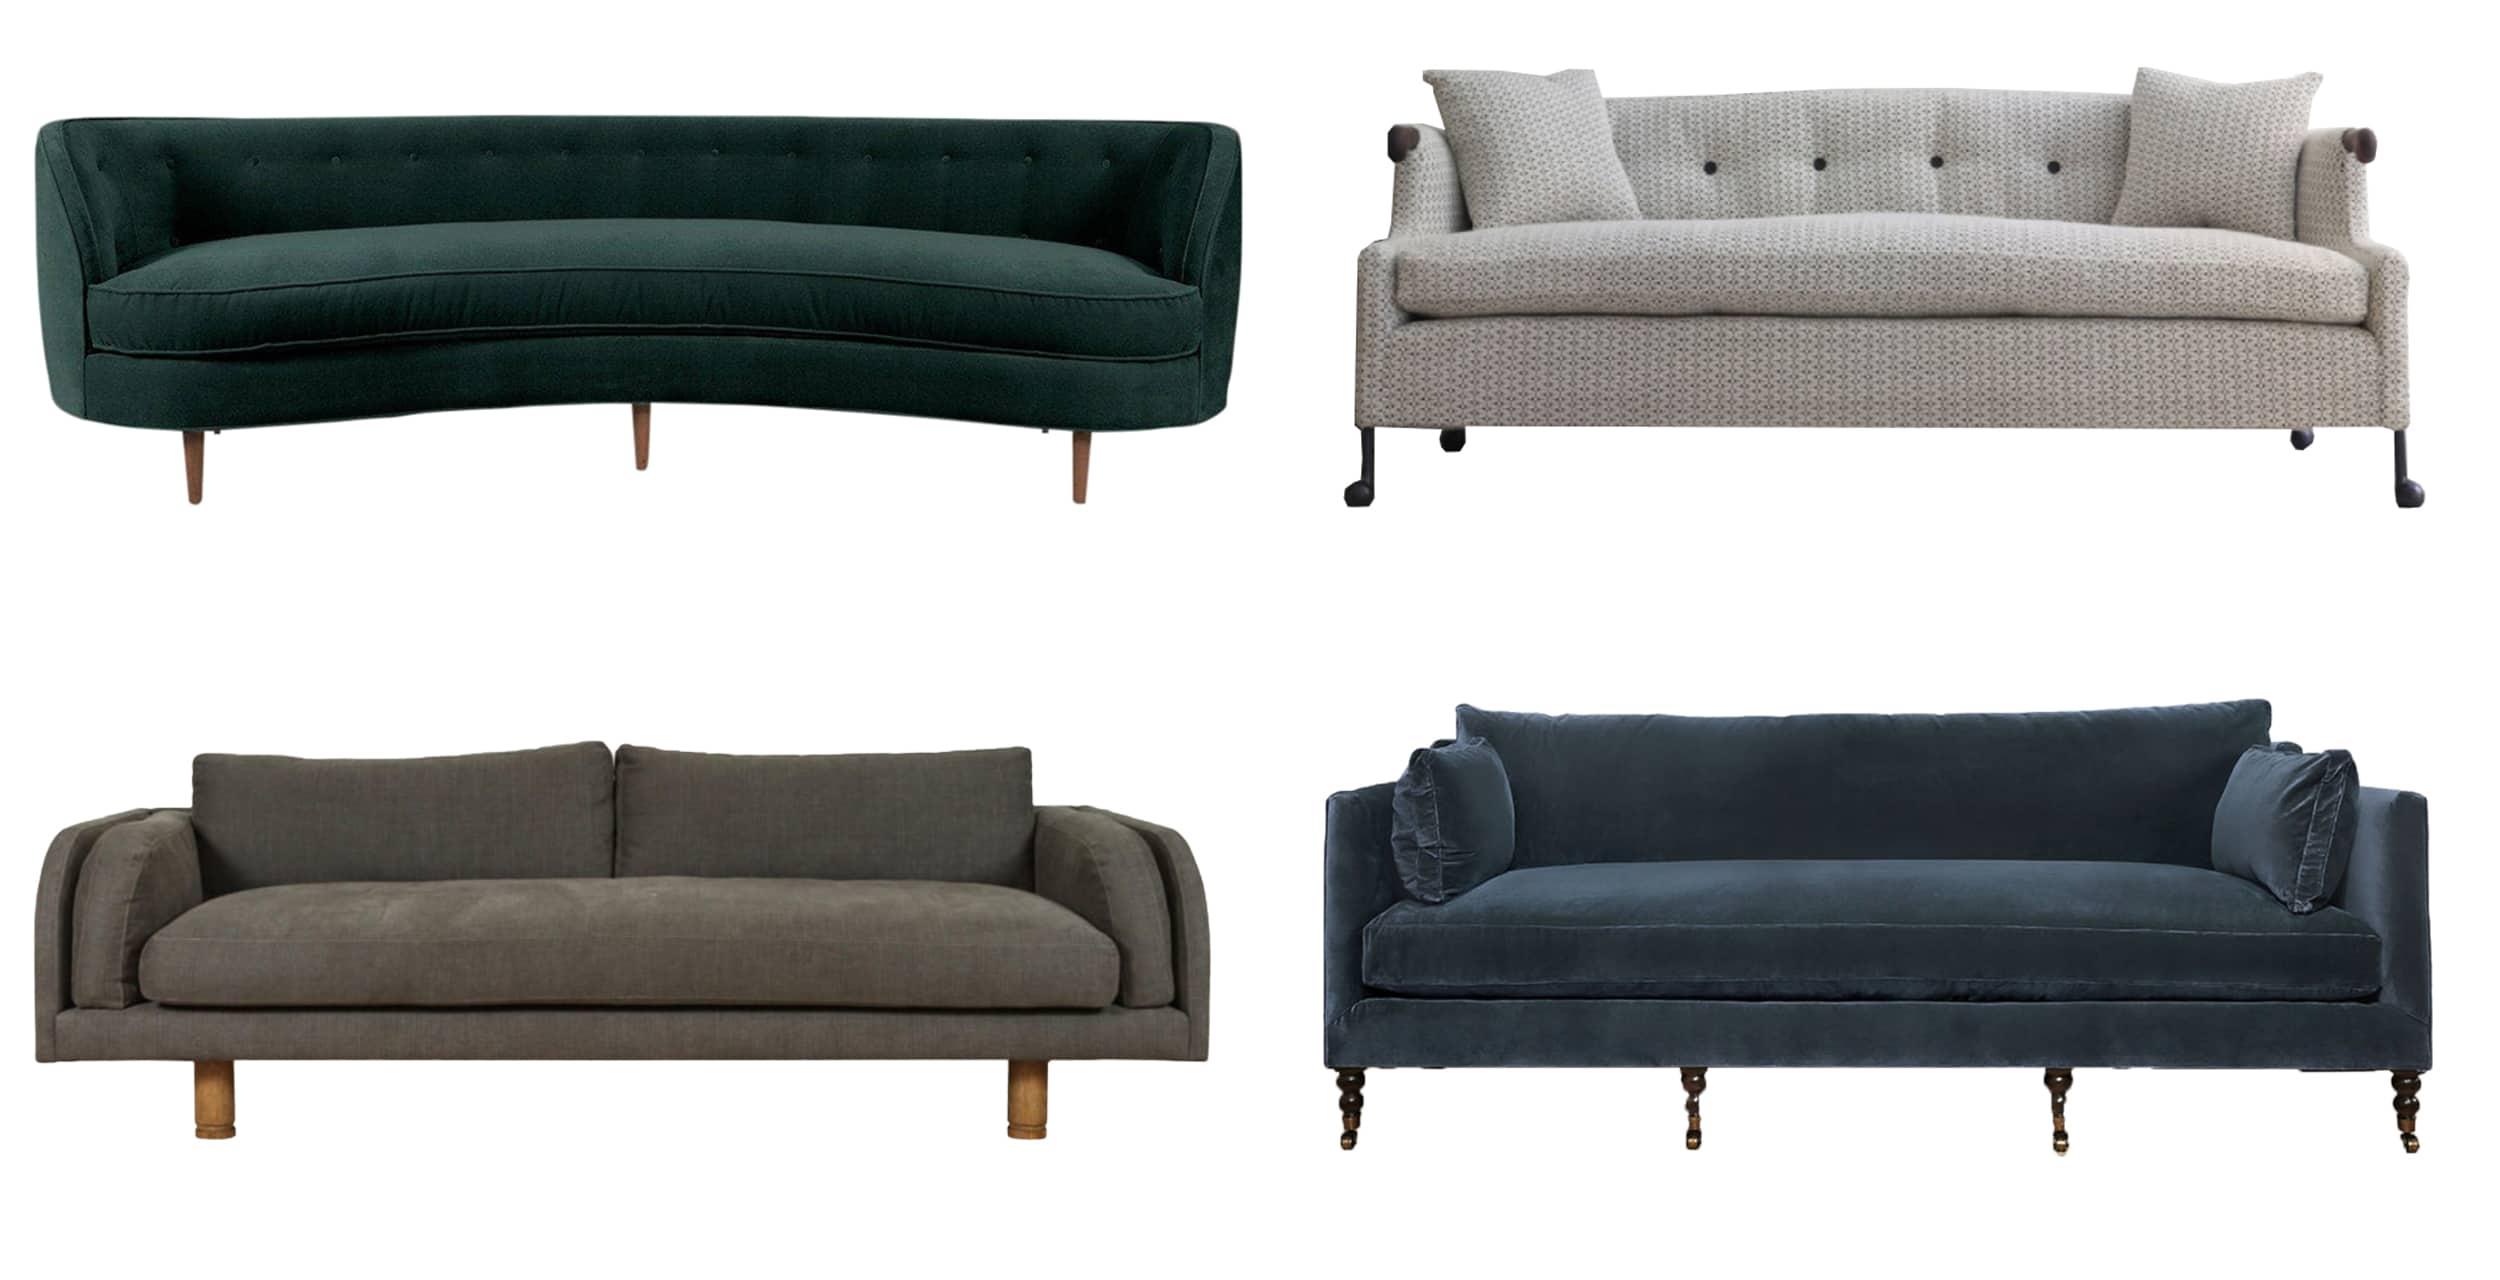 Emilyhenderson Waverly Living Room Refresh Sofa New 01